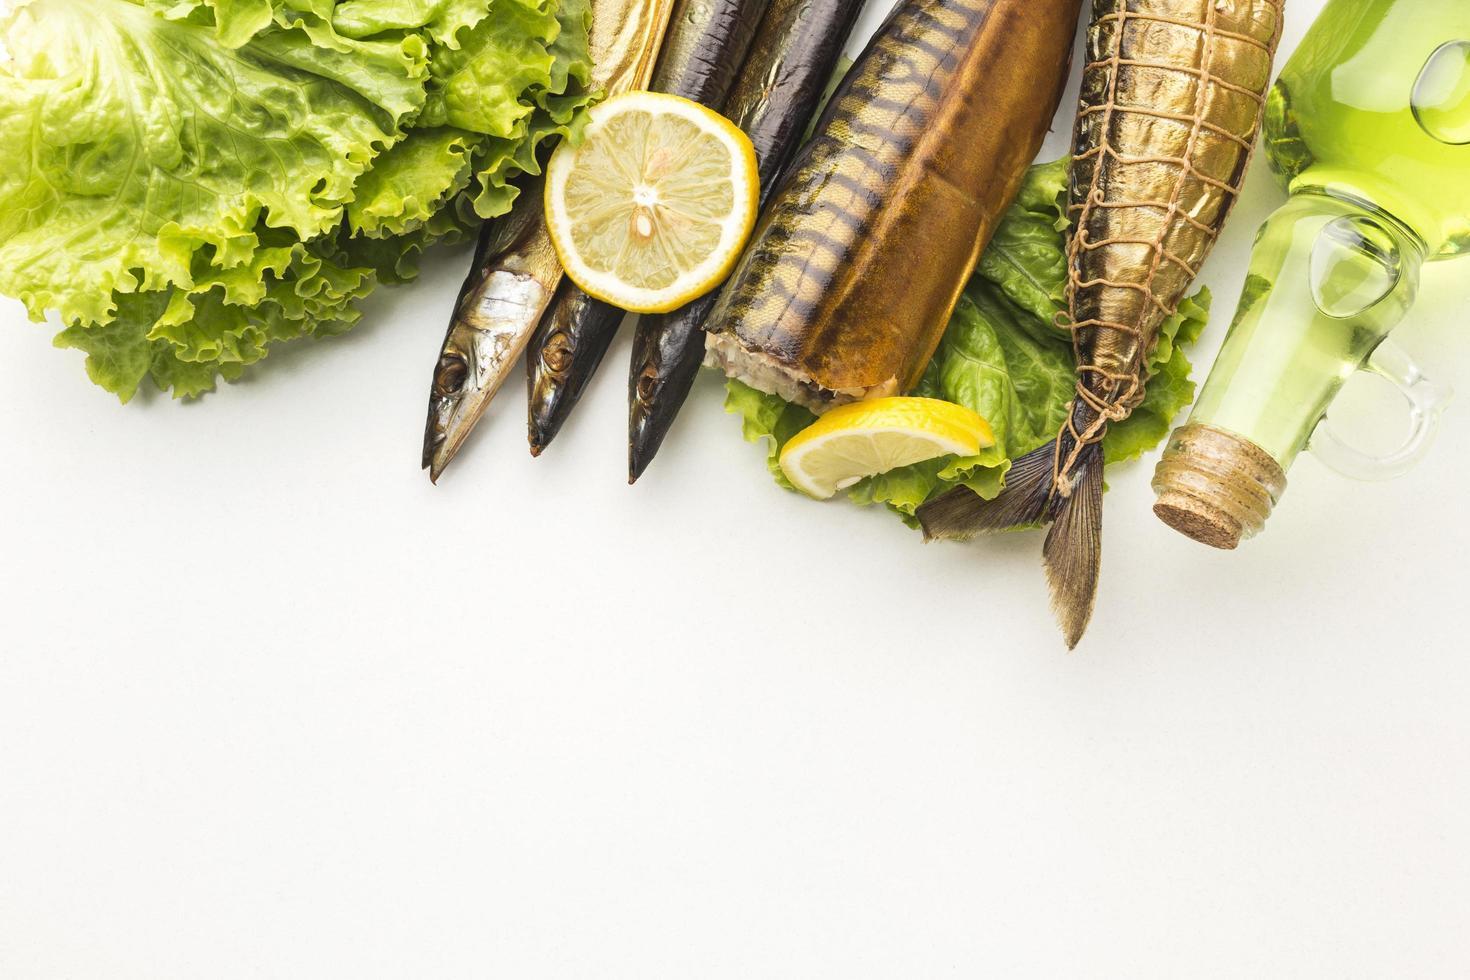 gerookte vis en andere ingrediënten foto